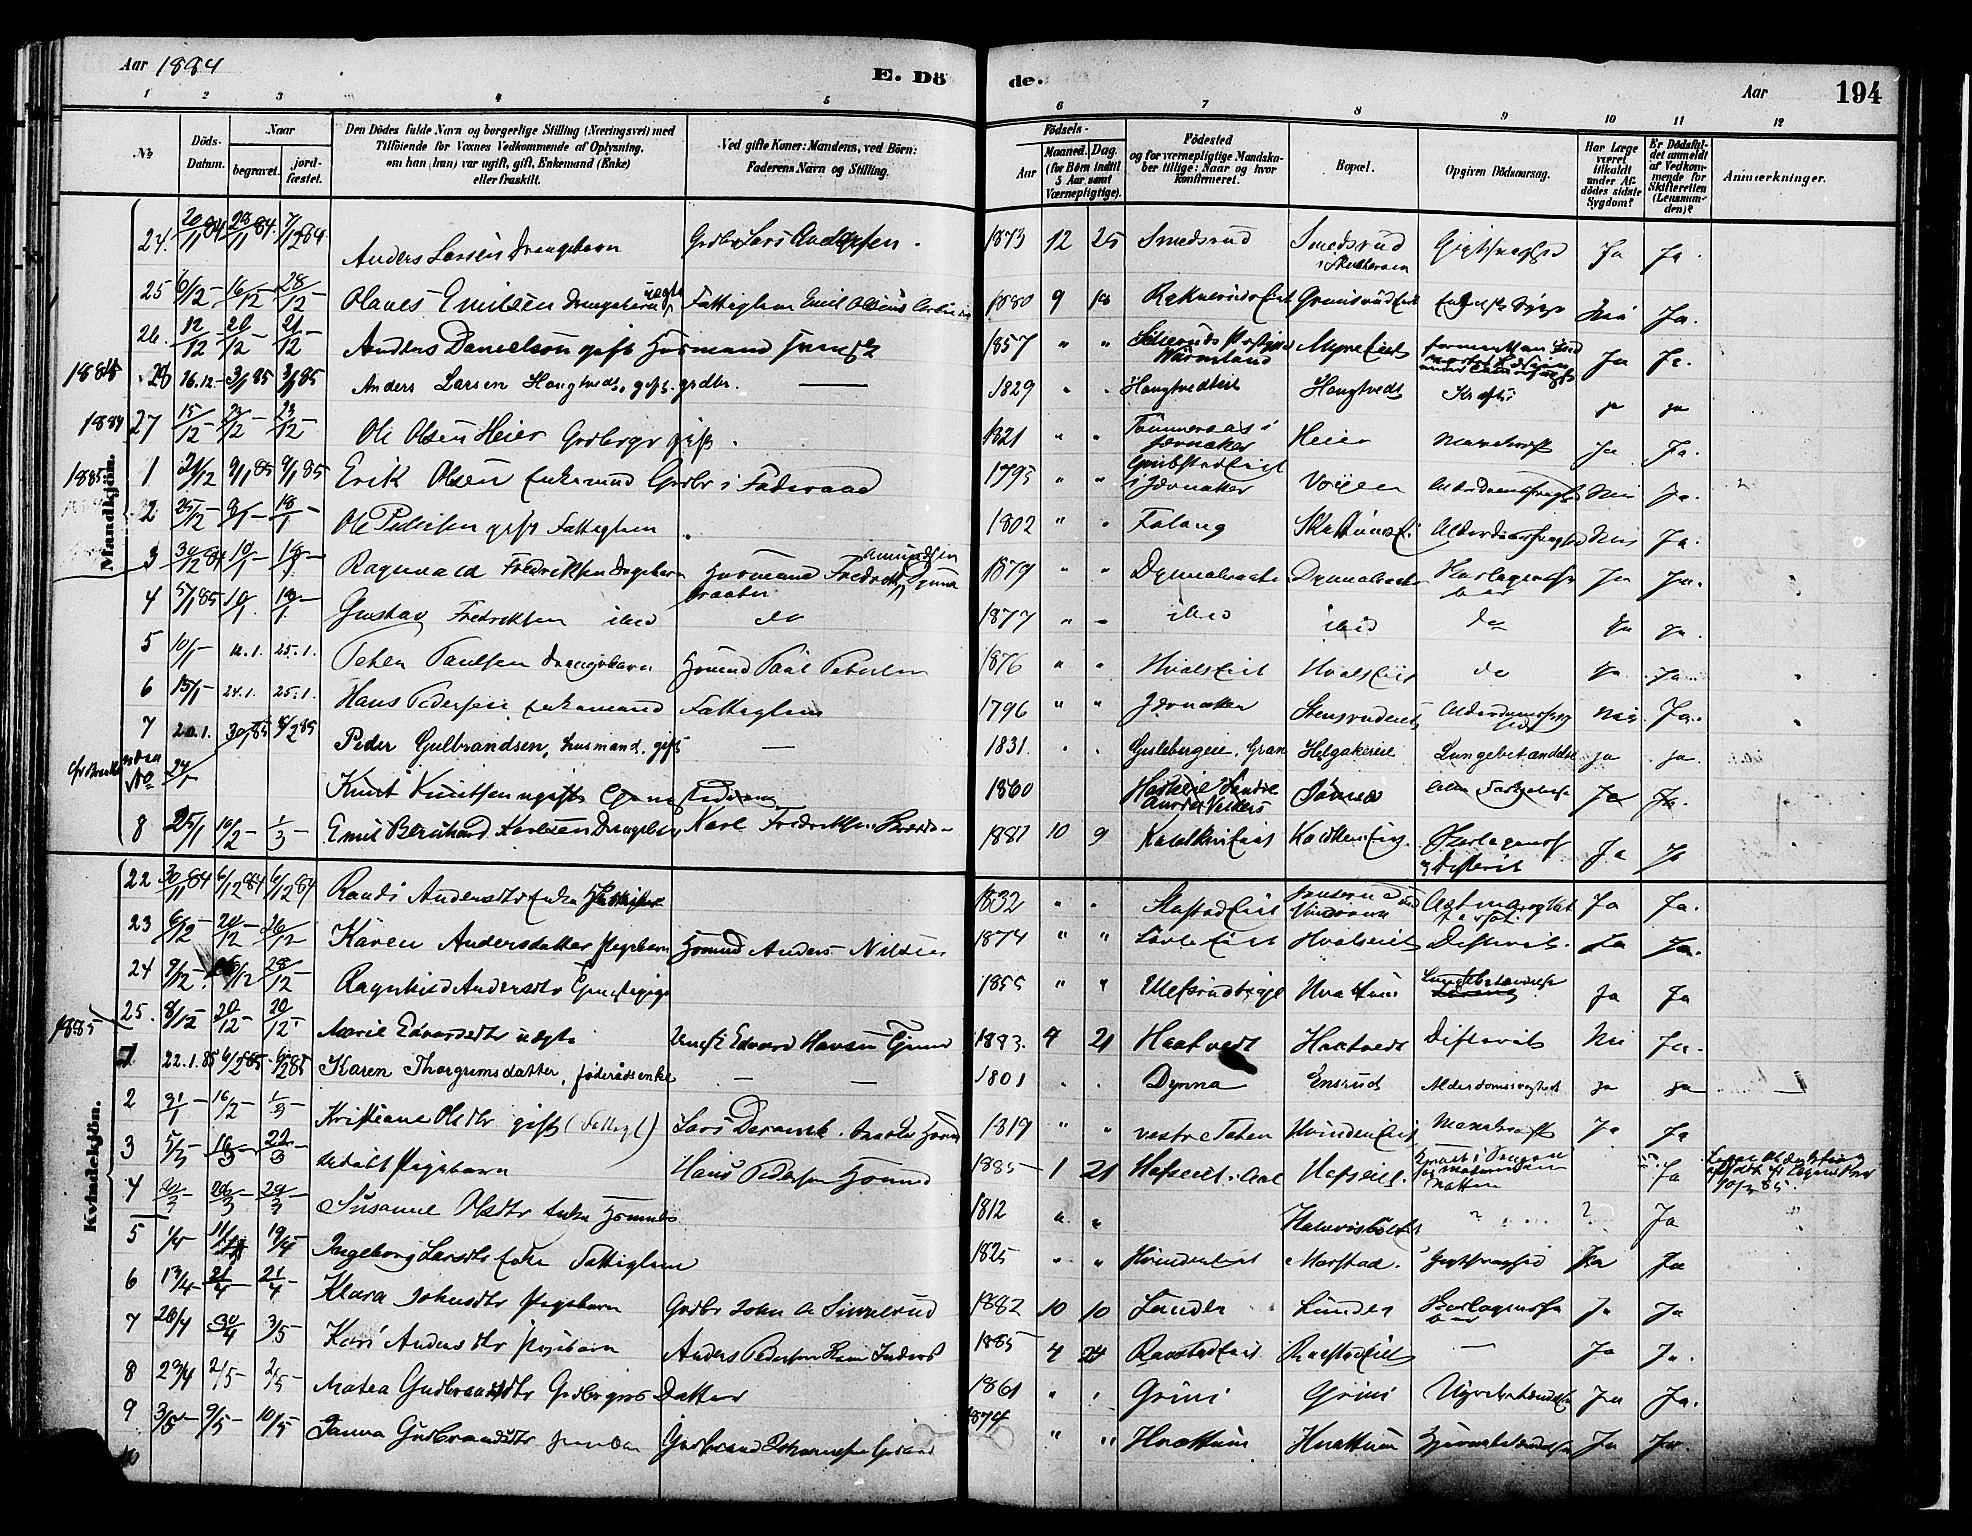 SAH, Gran prestekontor, Ministerialbok nr. 14, 1880-1889, s. 194